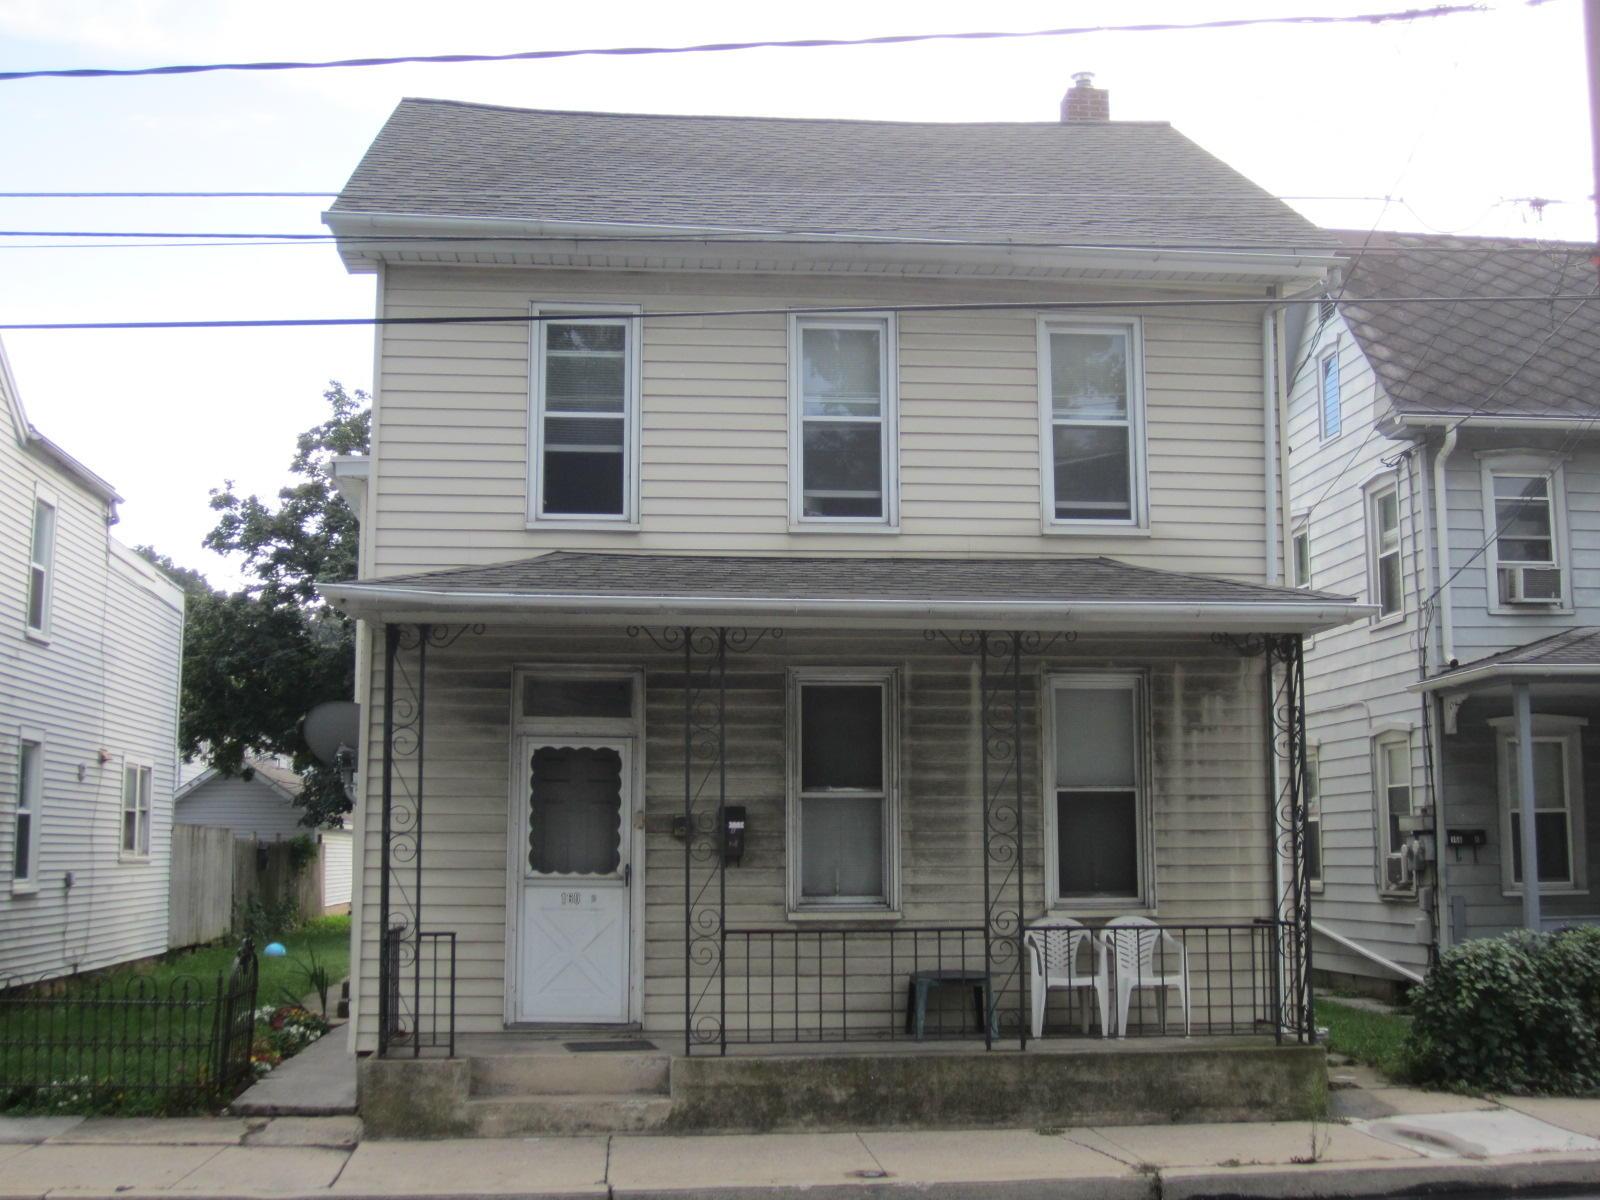 160 S MAIN STREET, MANHEIM, PA 17545